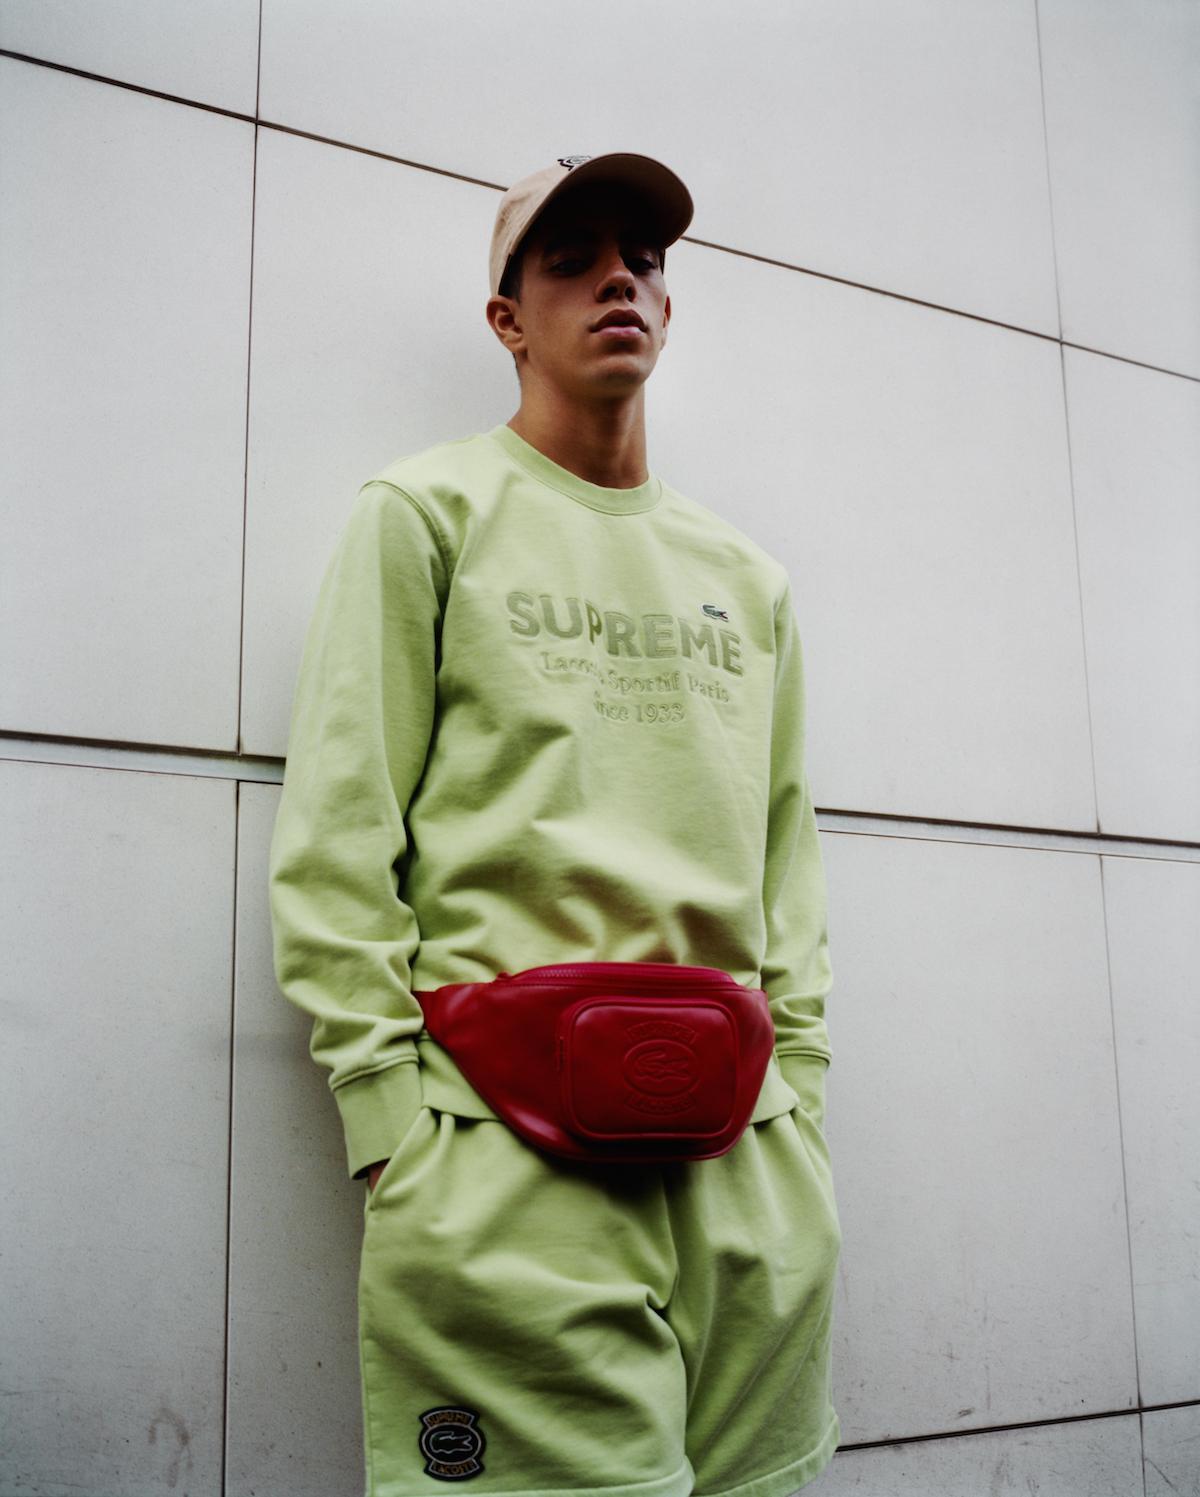 Supreme×LACOSTEコラボ第2弾!発売日と購入方法を要チェック! fashion180418_supreme-lacoste_5